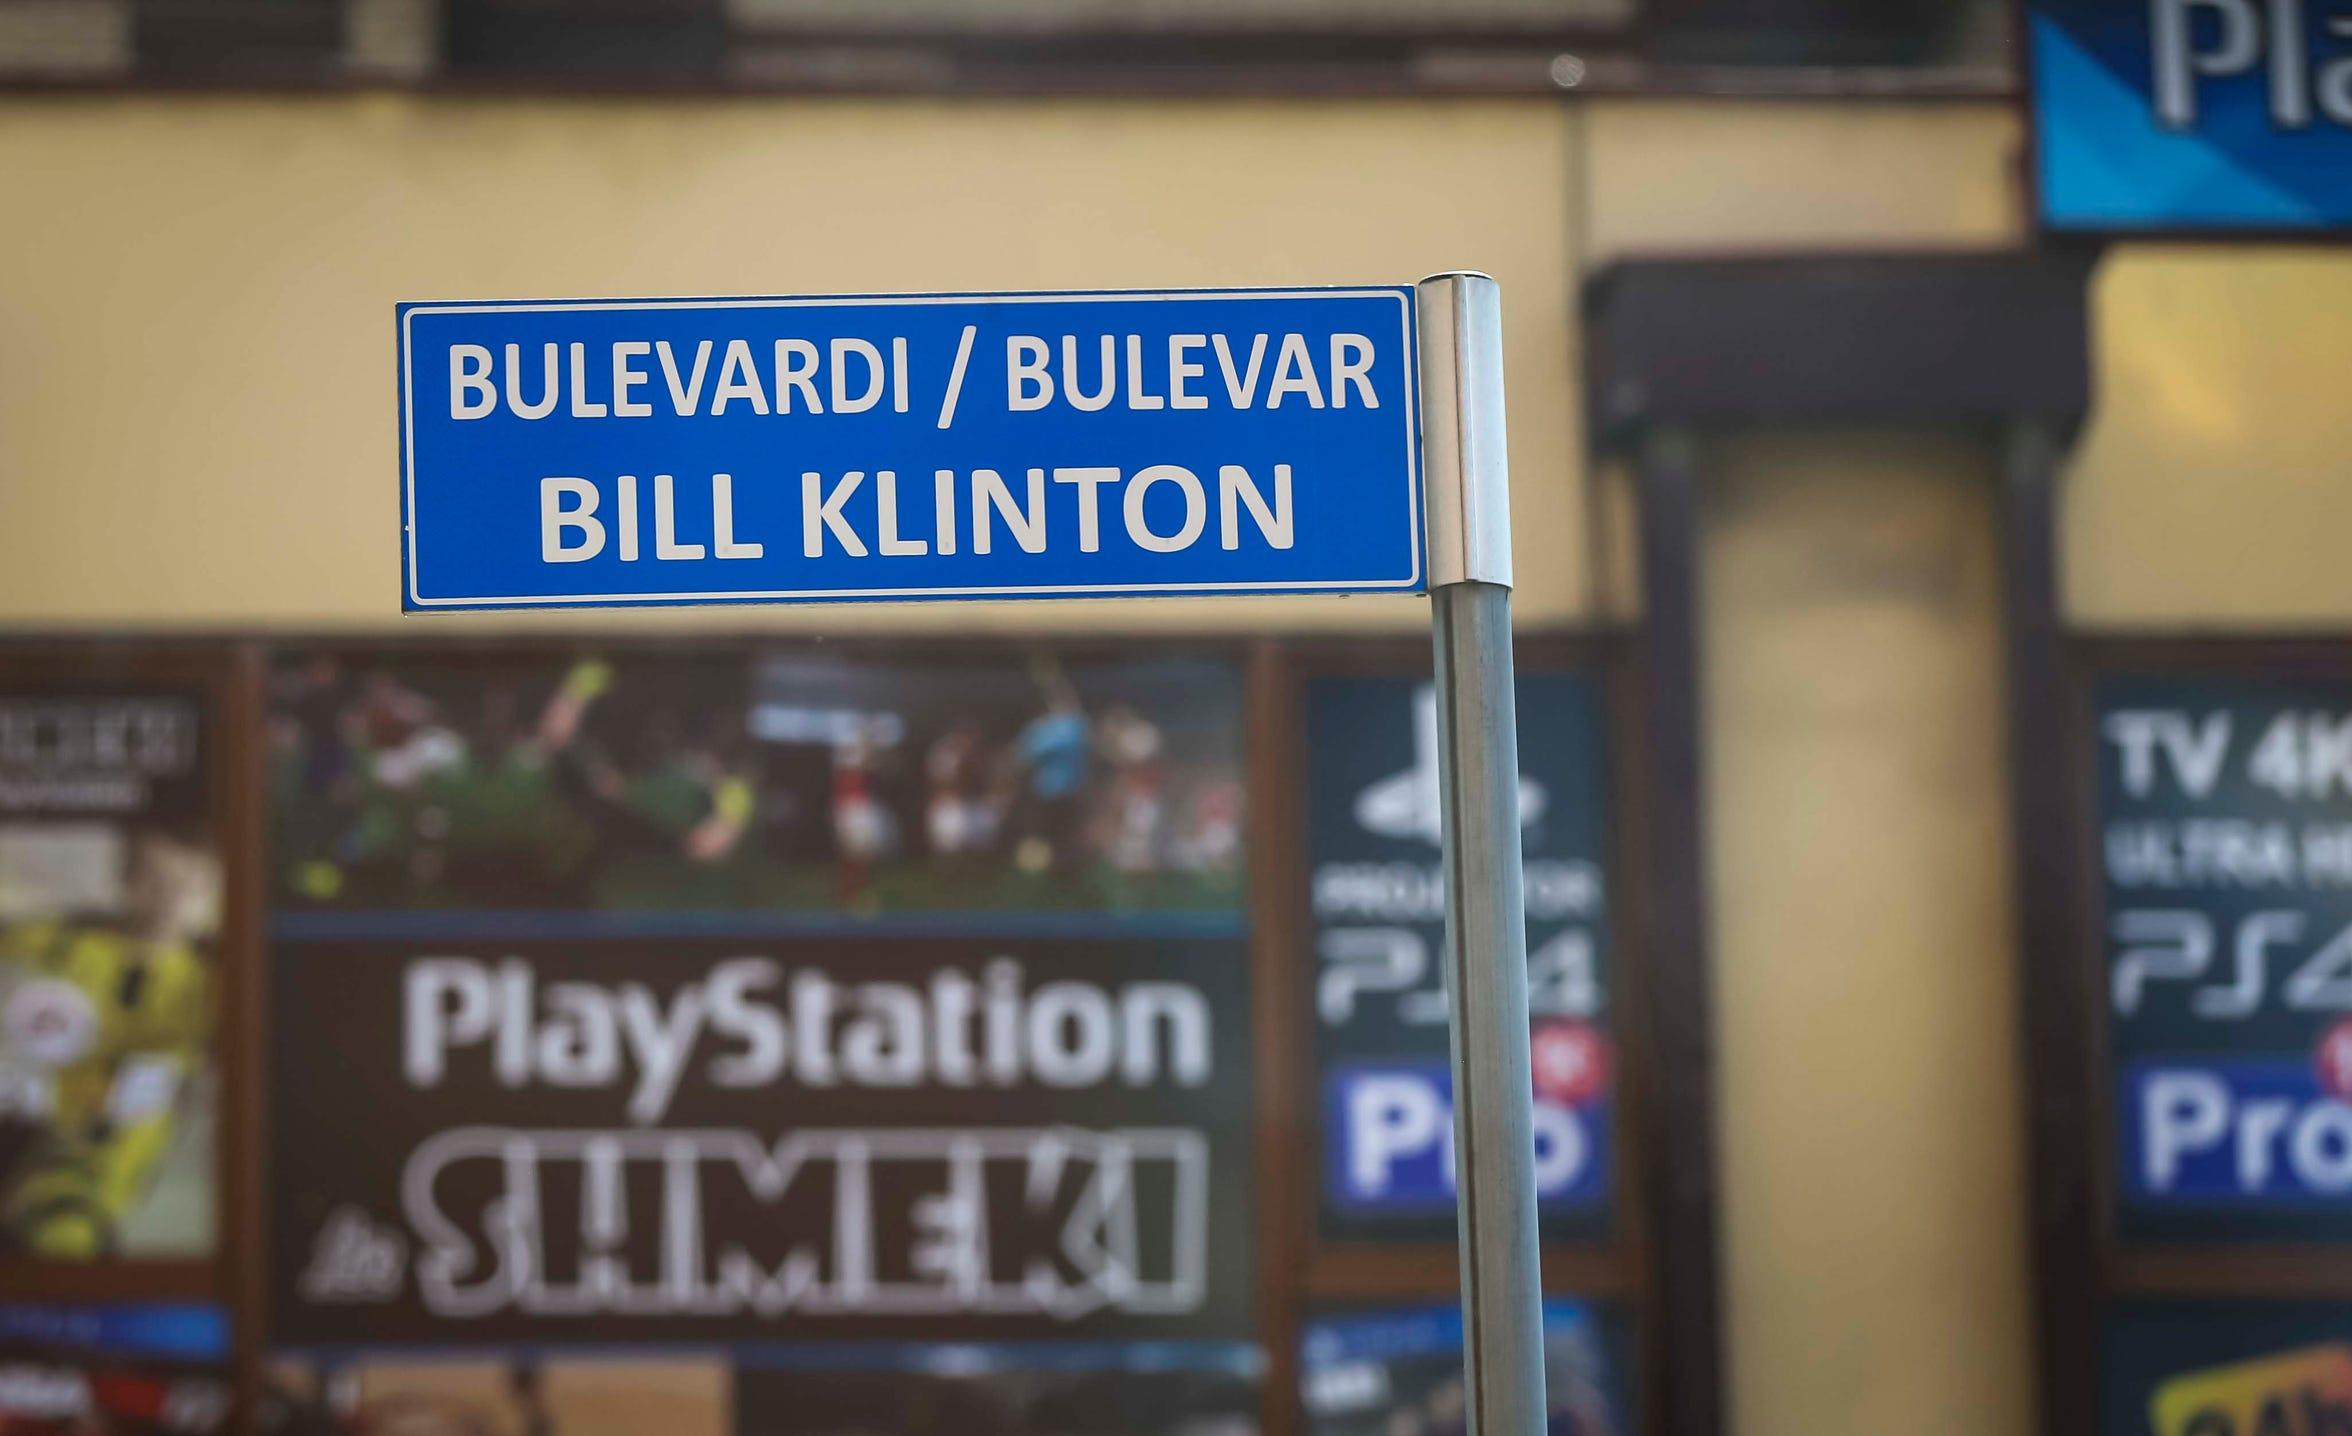 Bill Klinton Boulevard